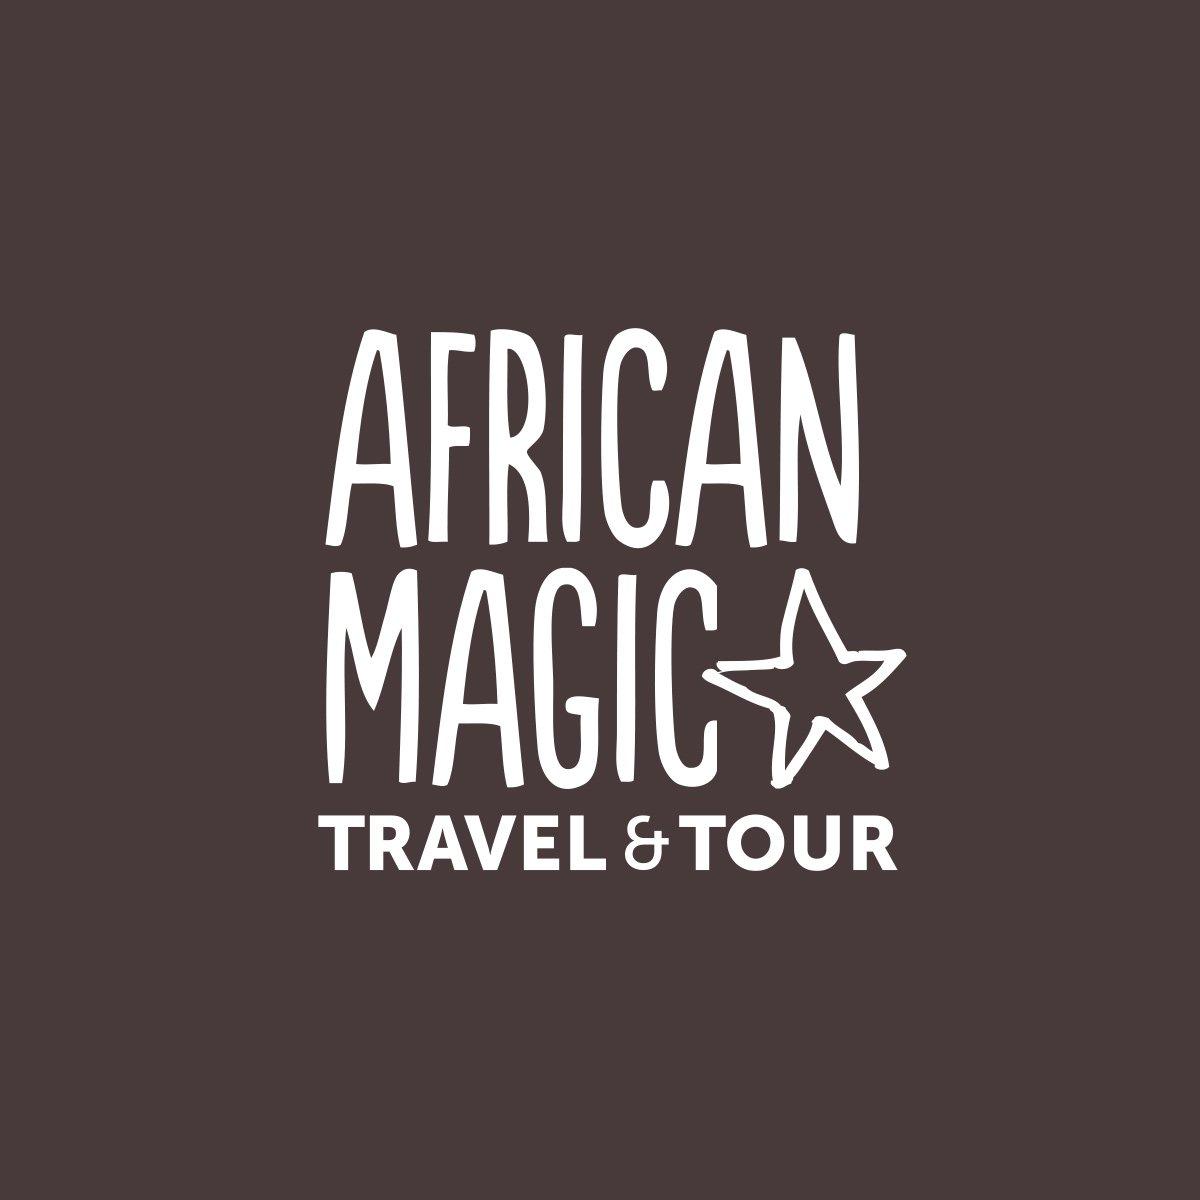 African Magic Travel and Tour Logo